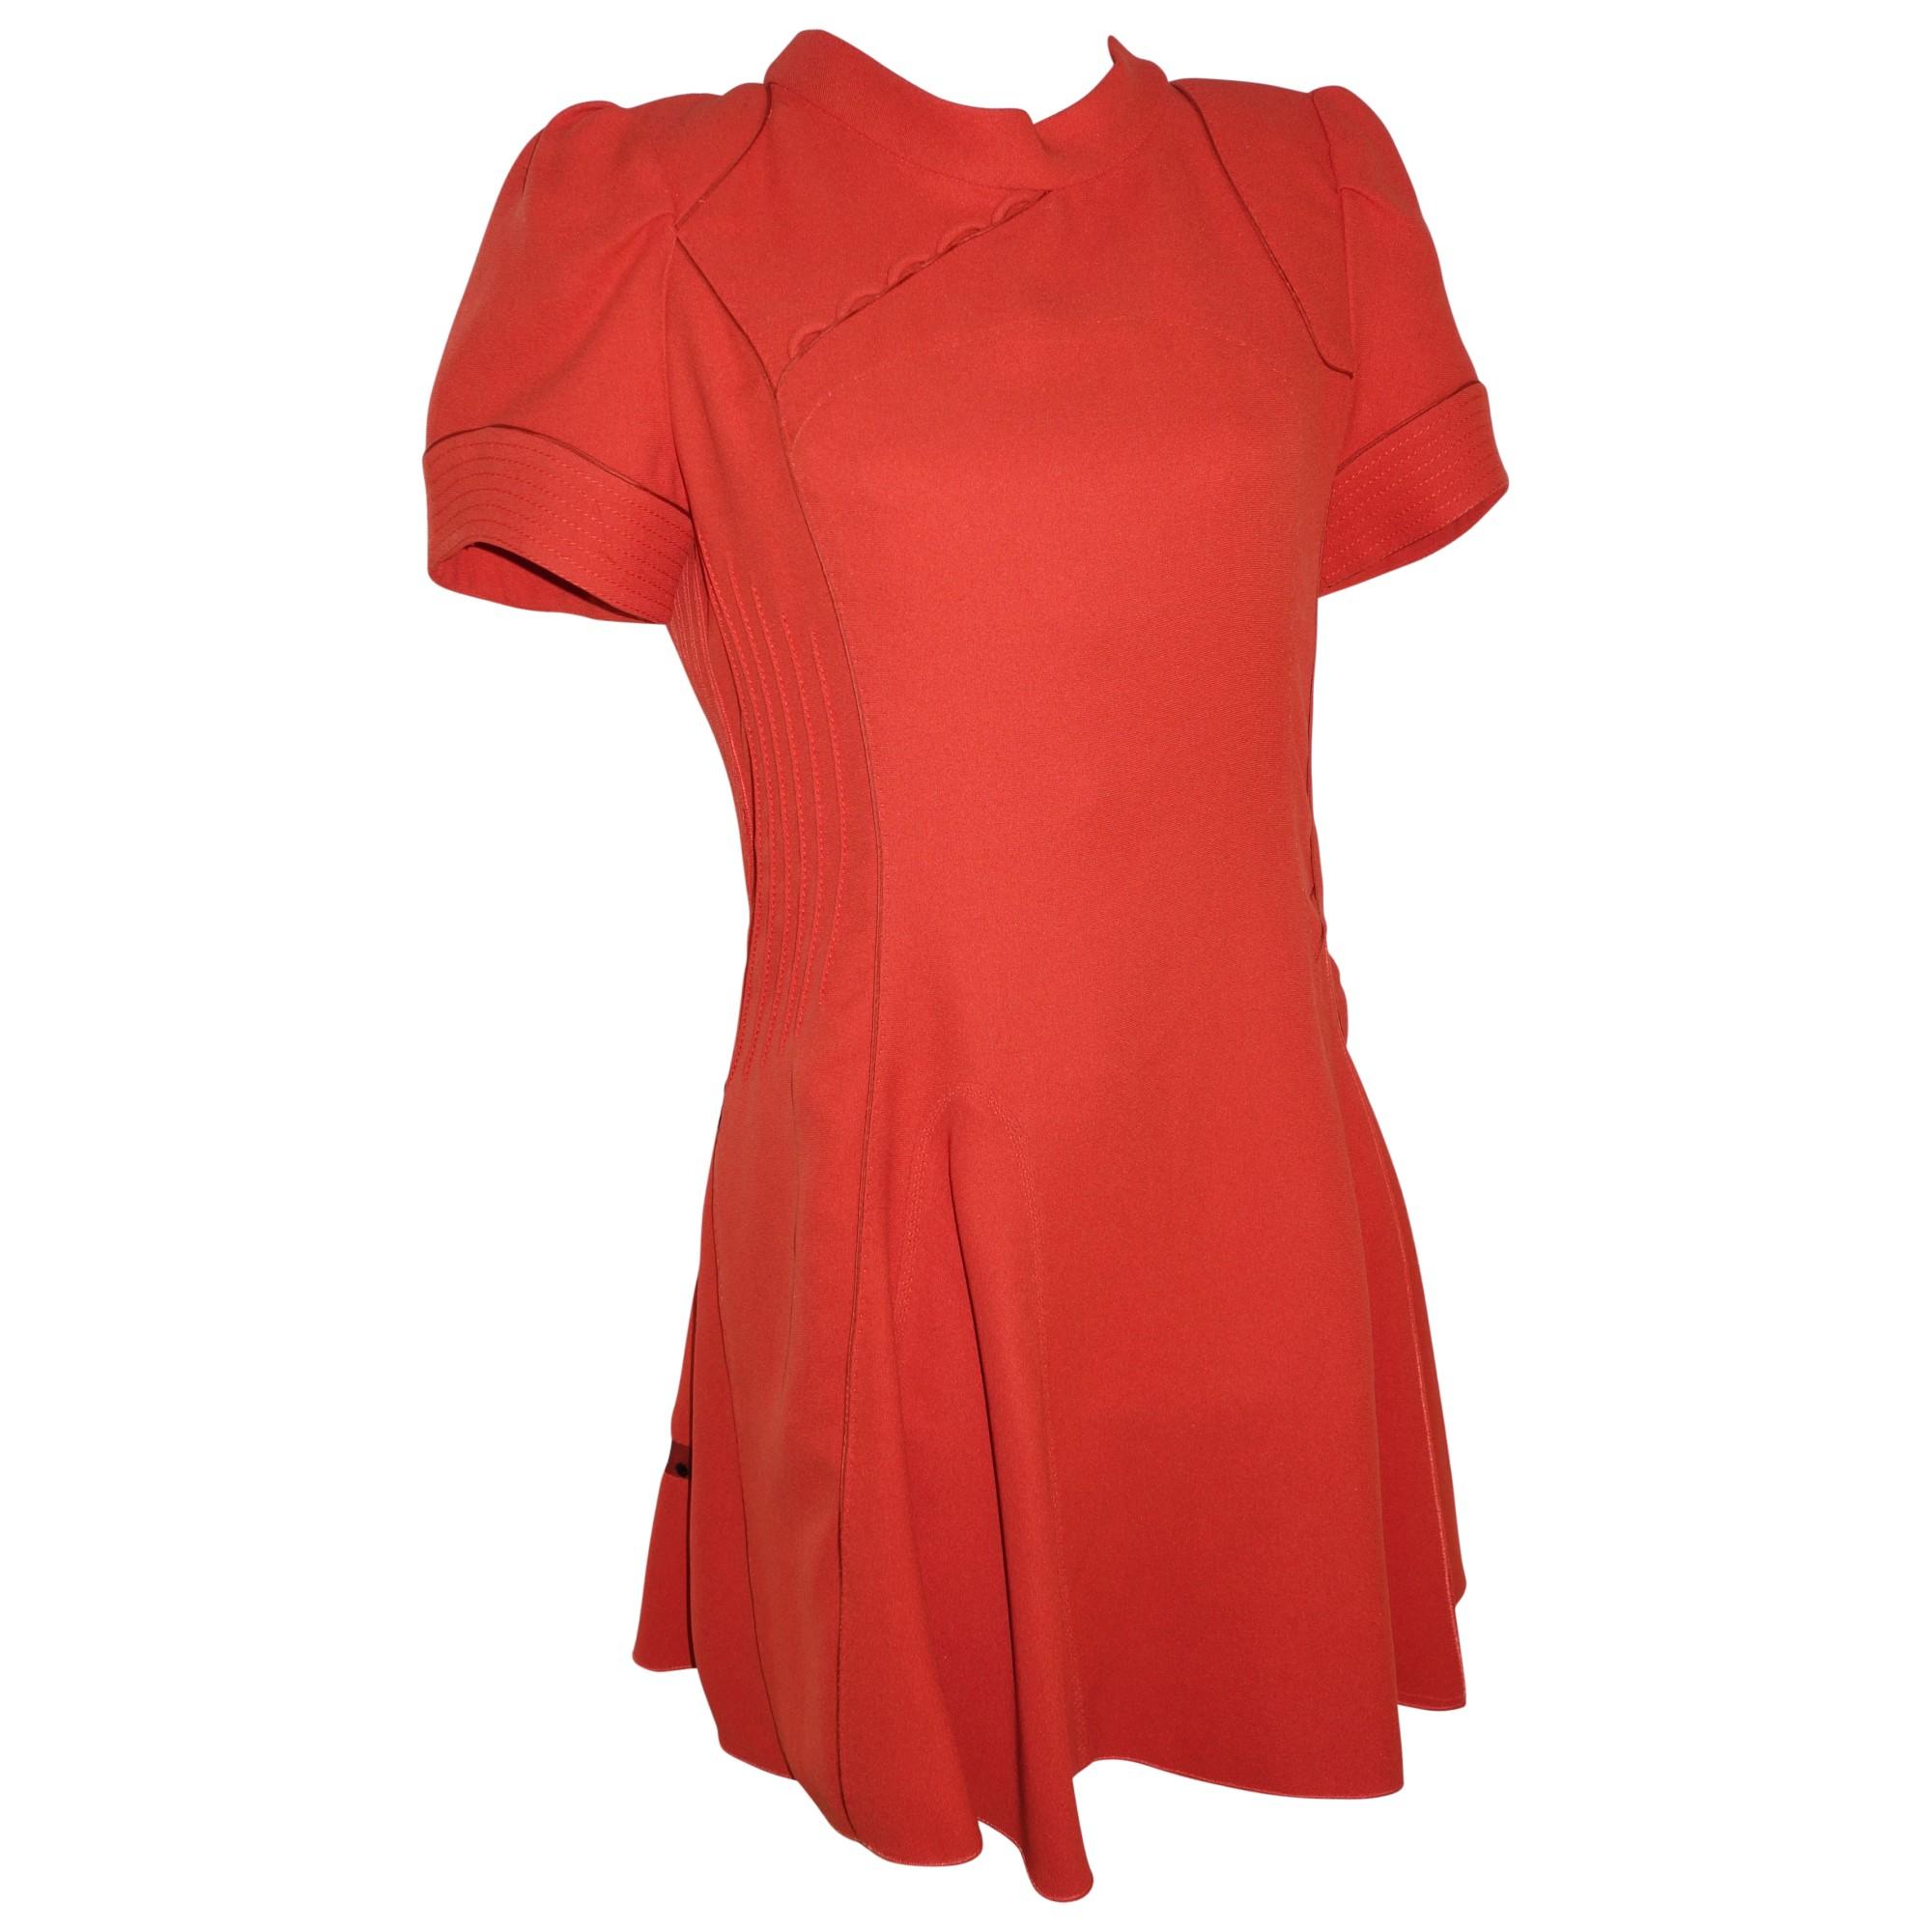 bdc55f64fc7 Robe courte LOUIS VUITTON Orange